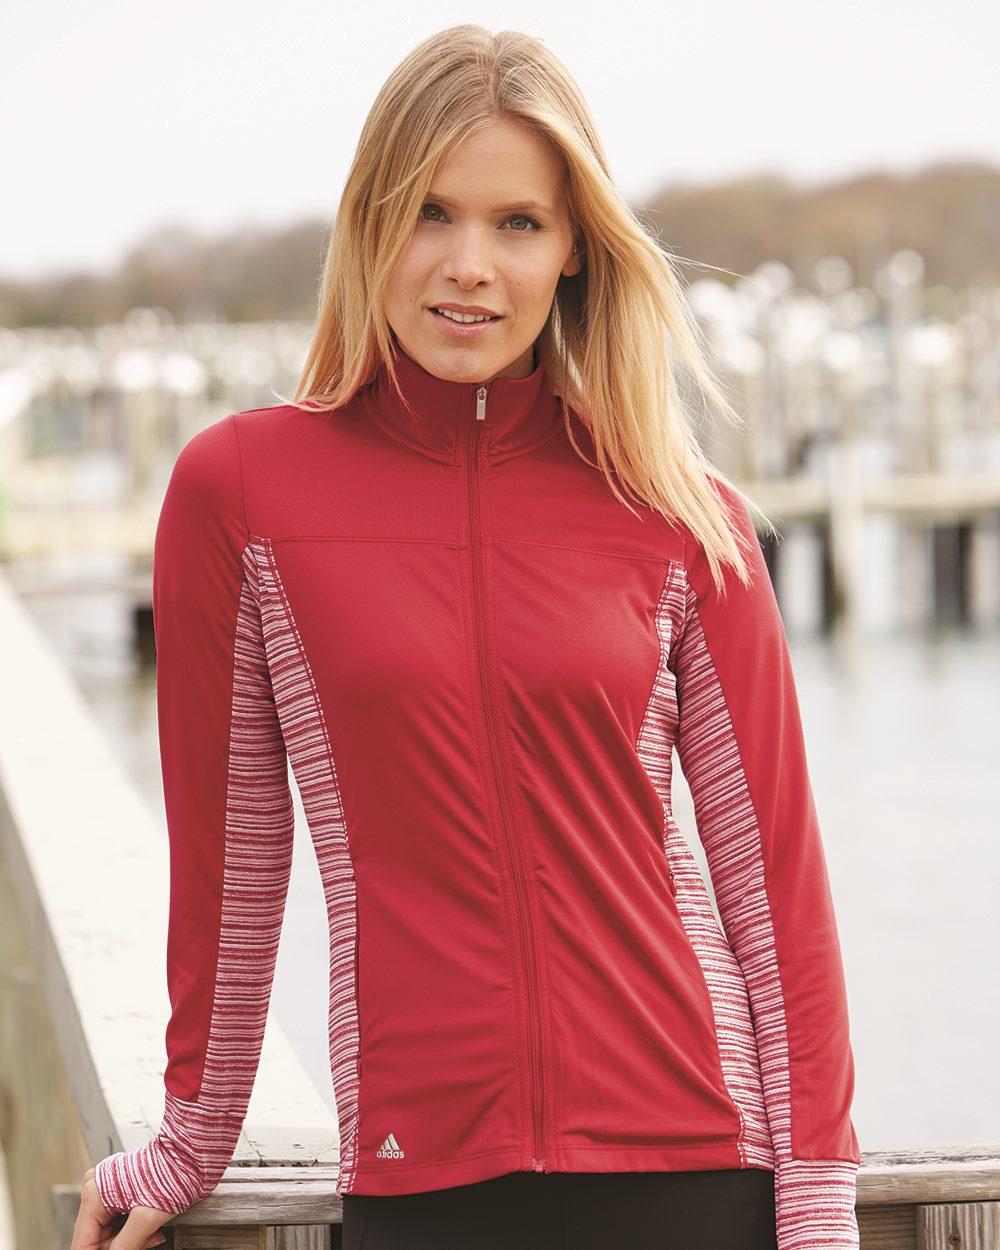 Adidas A202 - Golf Women's Rangewear Full-Zip Jacket